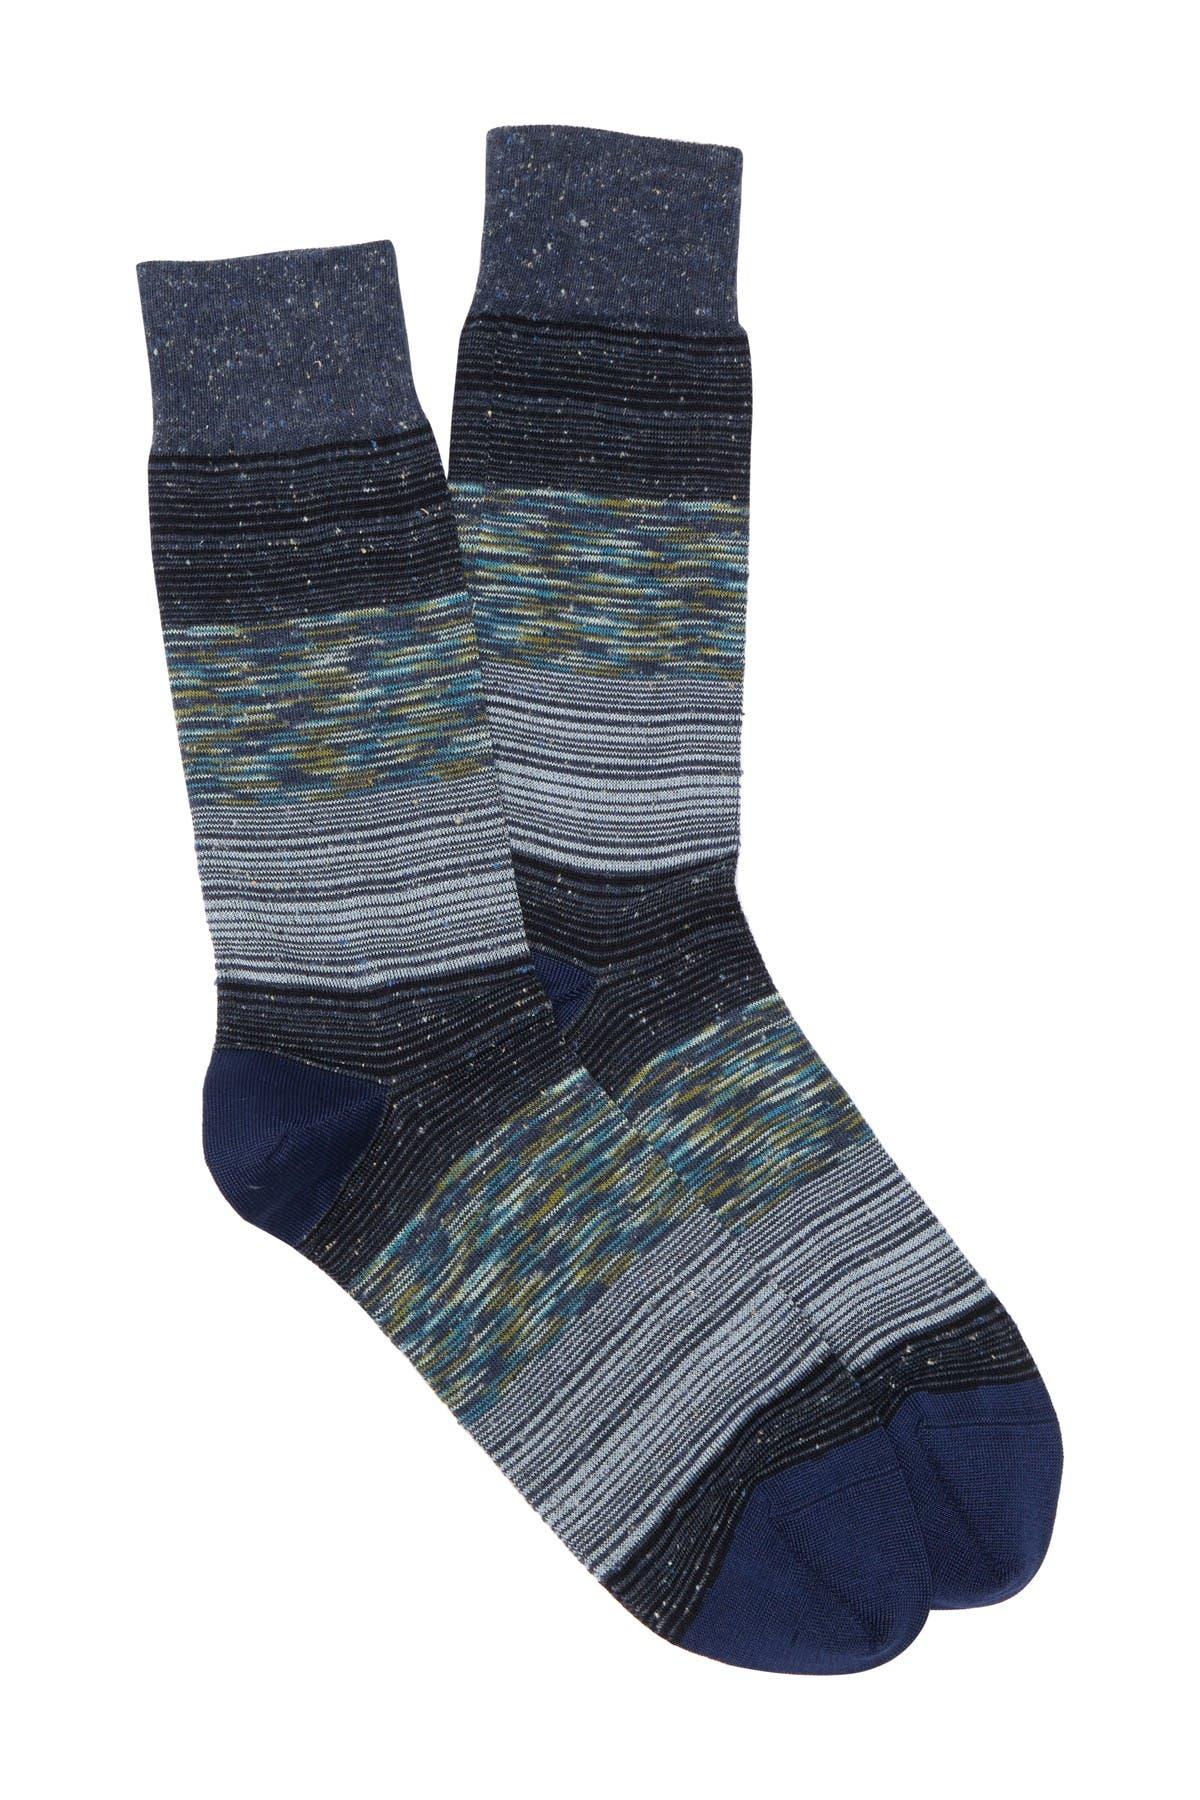 Image of Bugatchi Striped Mid Calf Socks